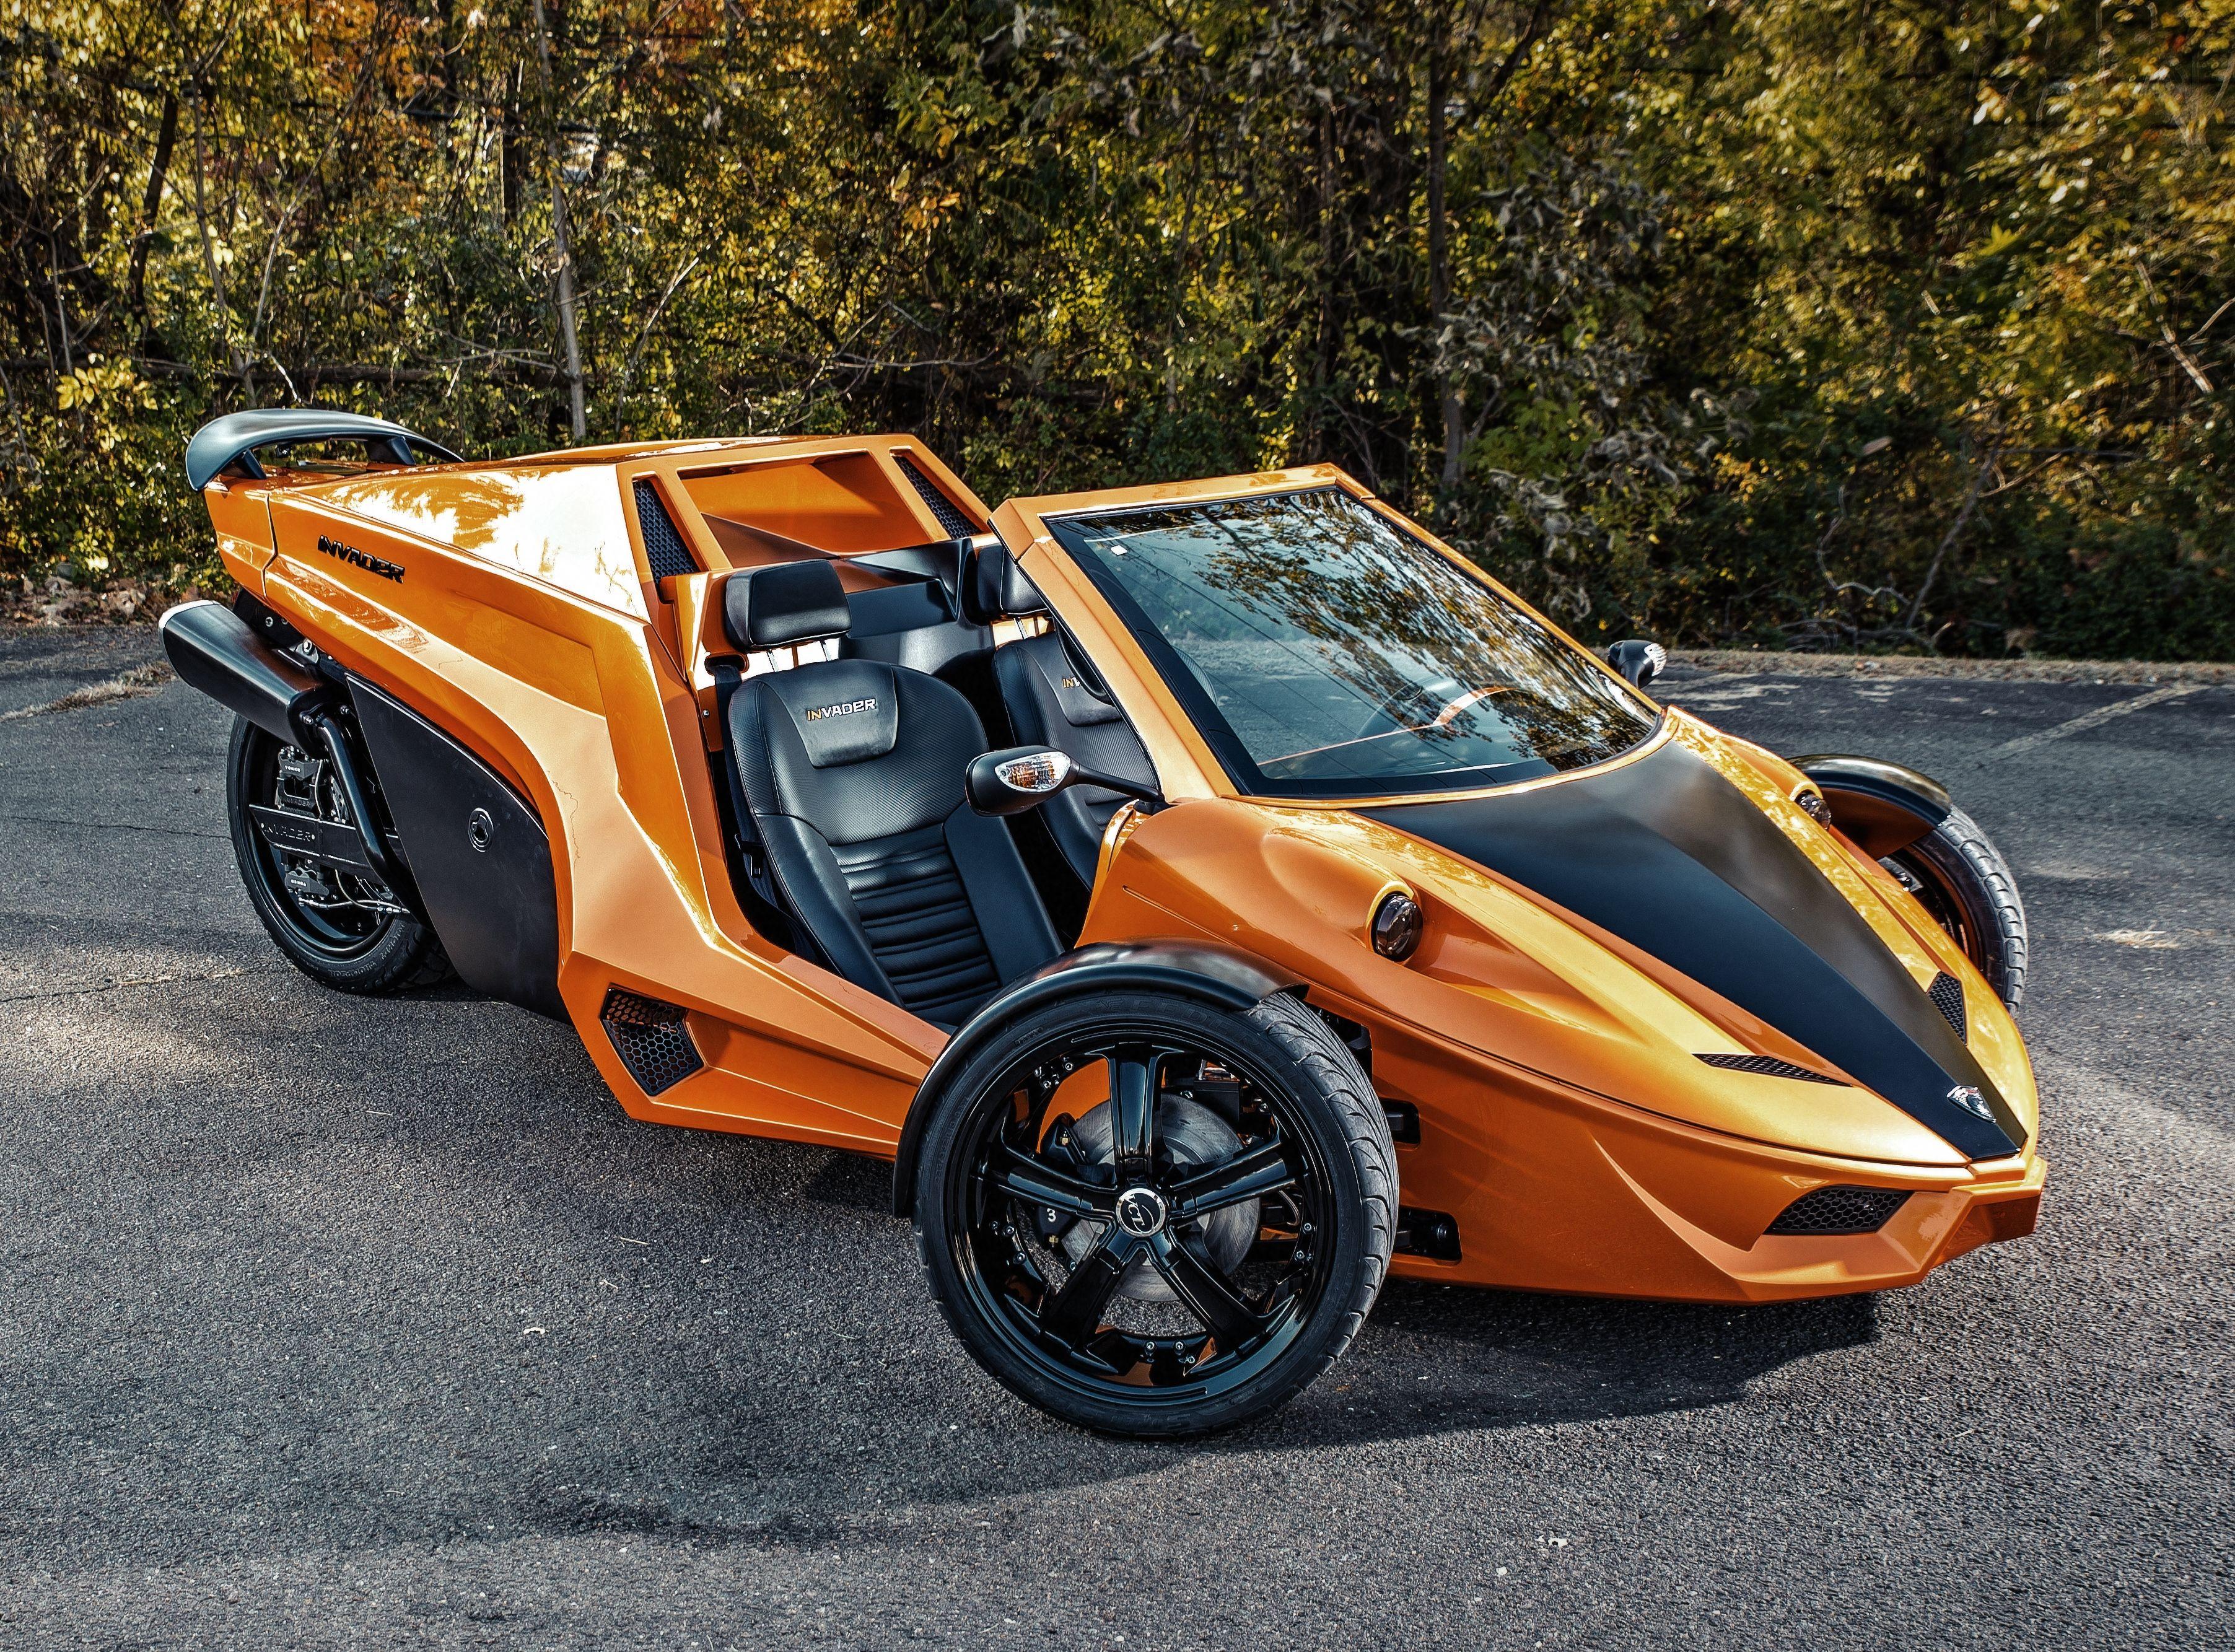 Orange Black Tanom Invader Tc 3 Coupe Polaris Slingshot Trike Motorcycle Reverse Trike